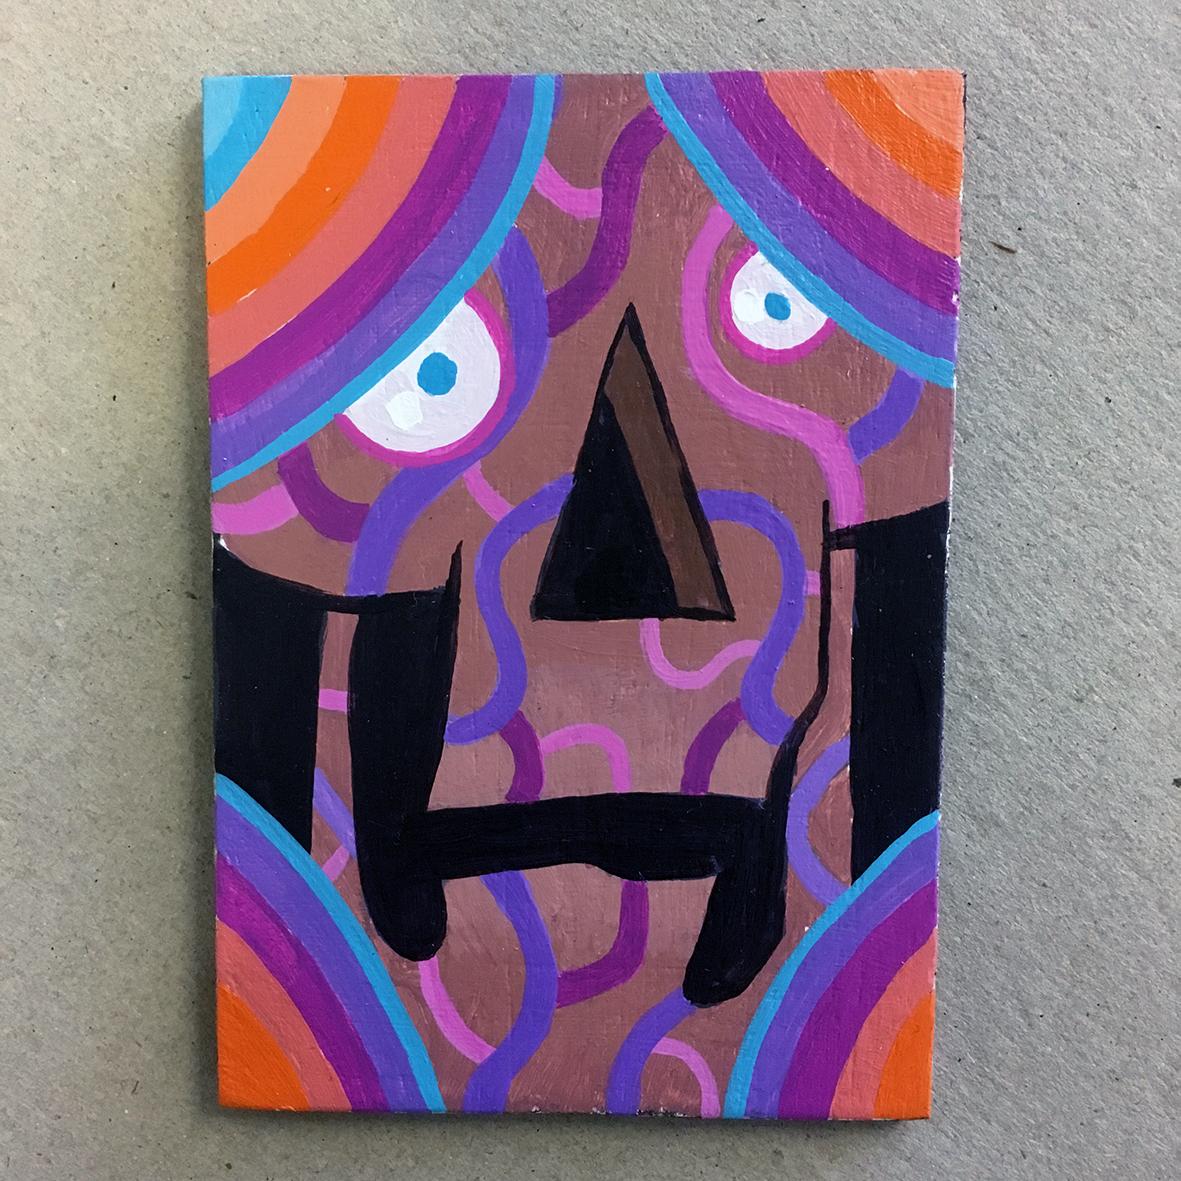 Sweet Skull 2 painting